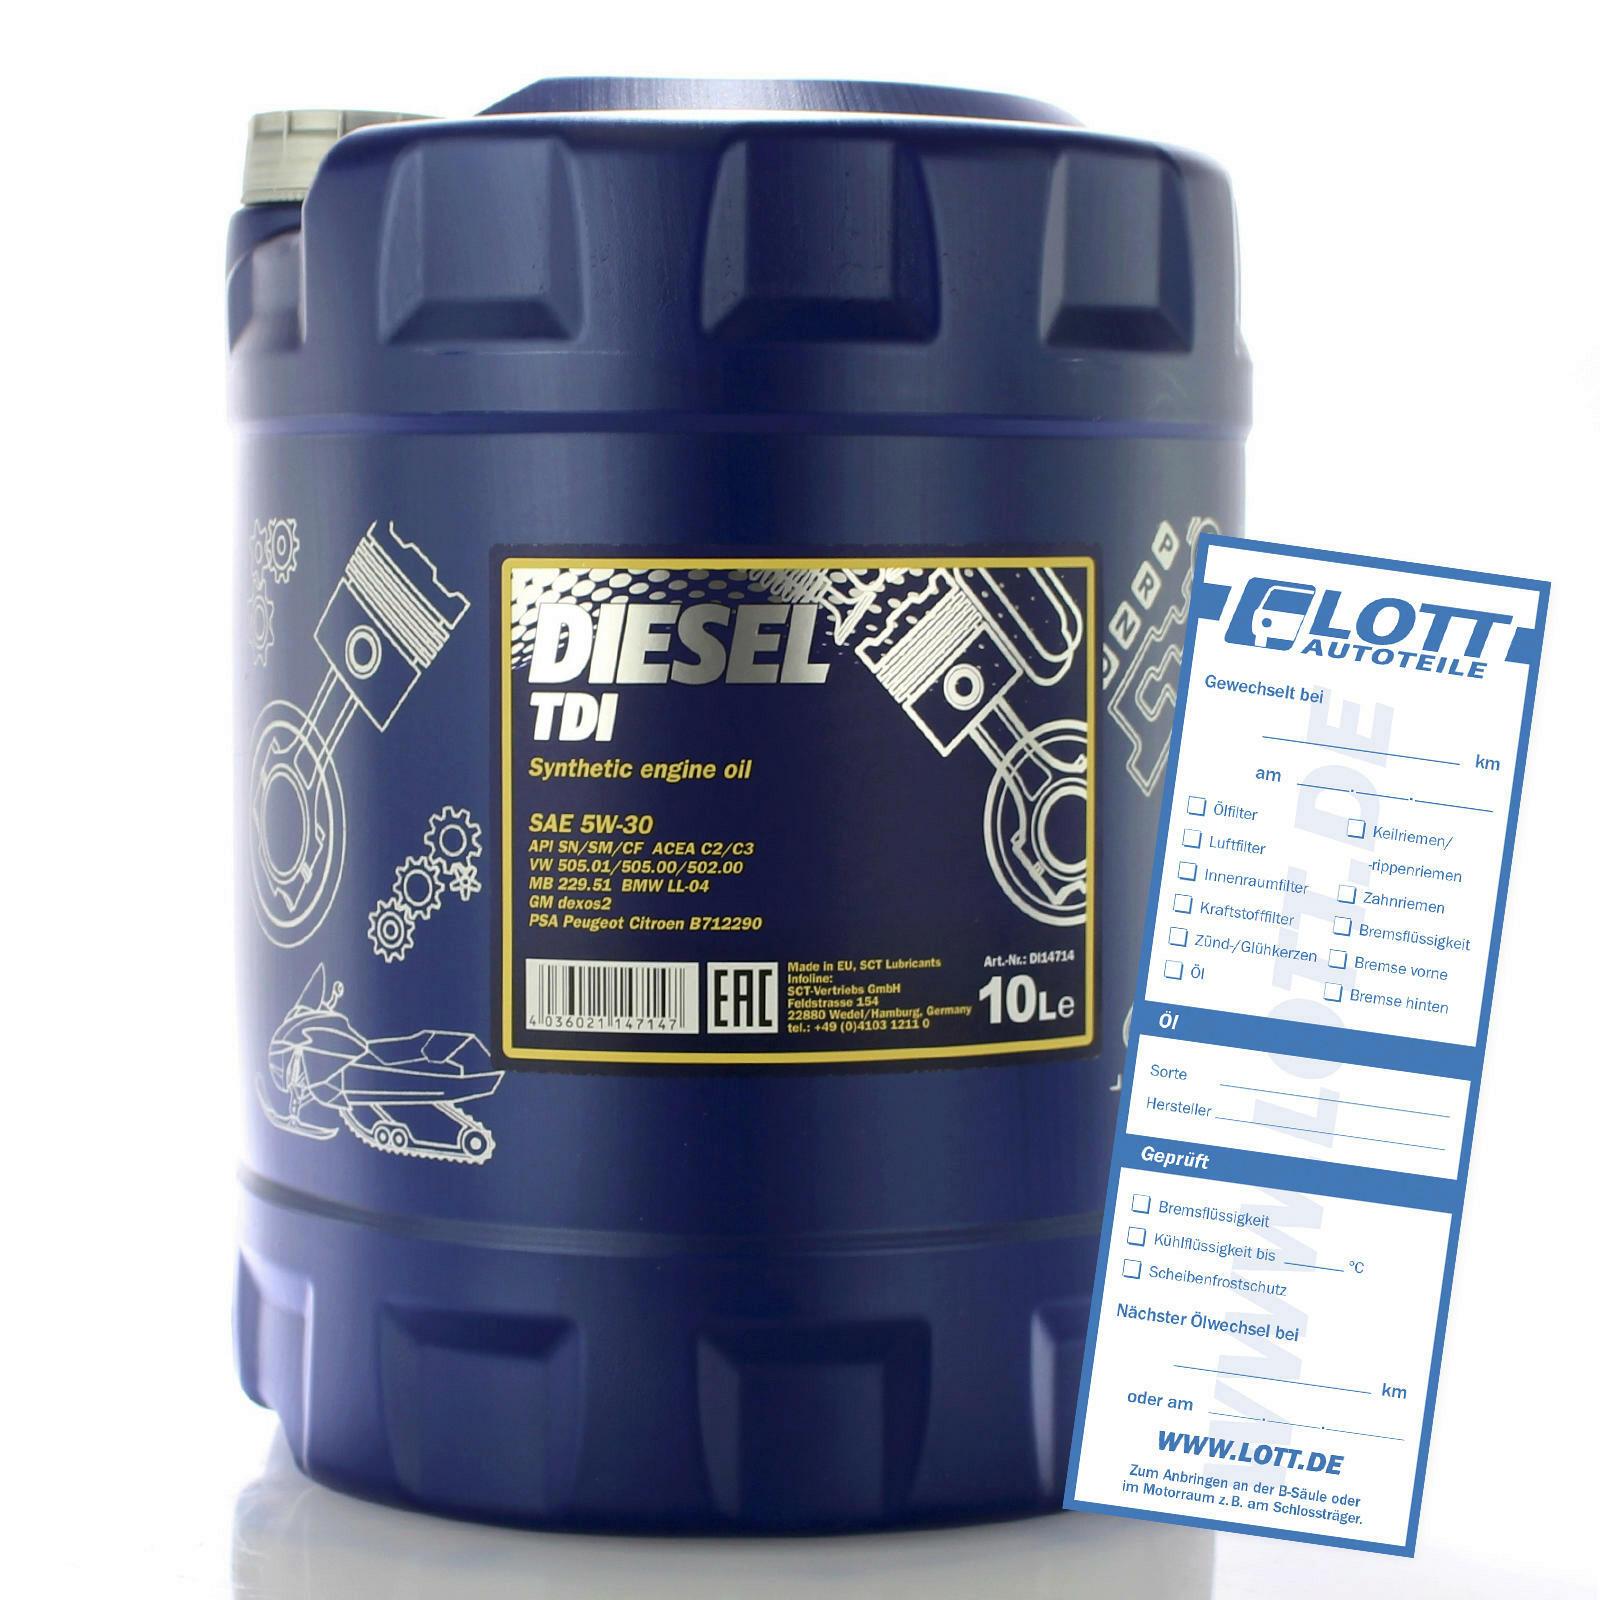 Mannol Diesel TDI Motoröl 10L